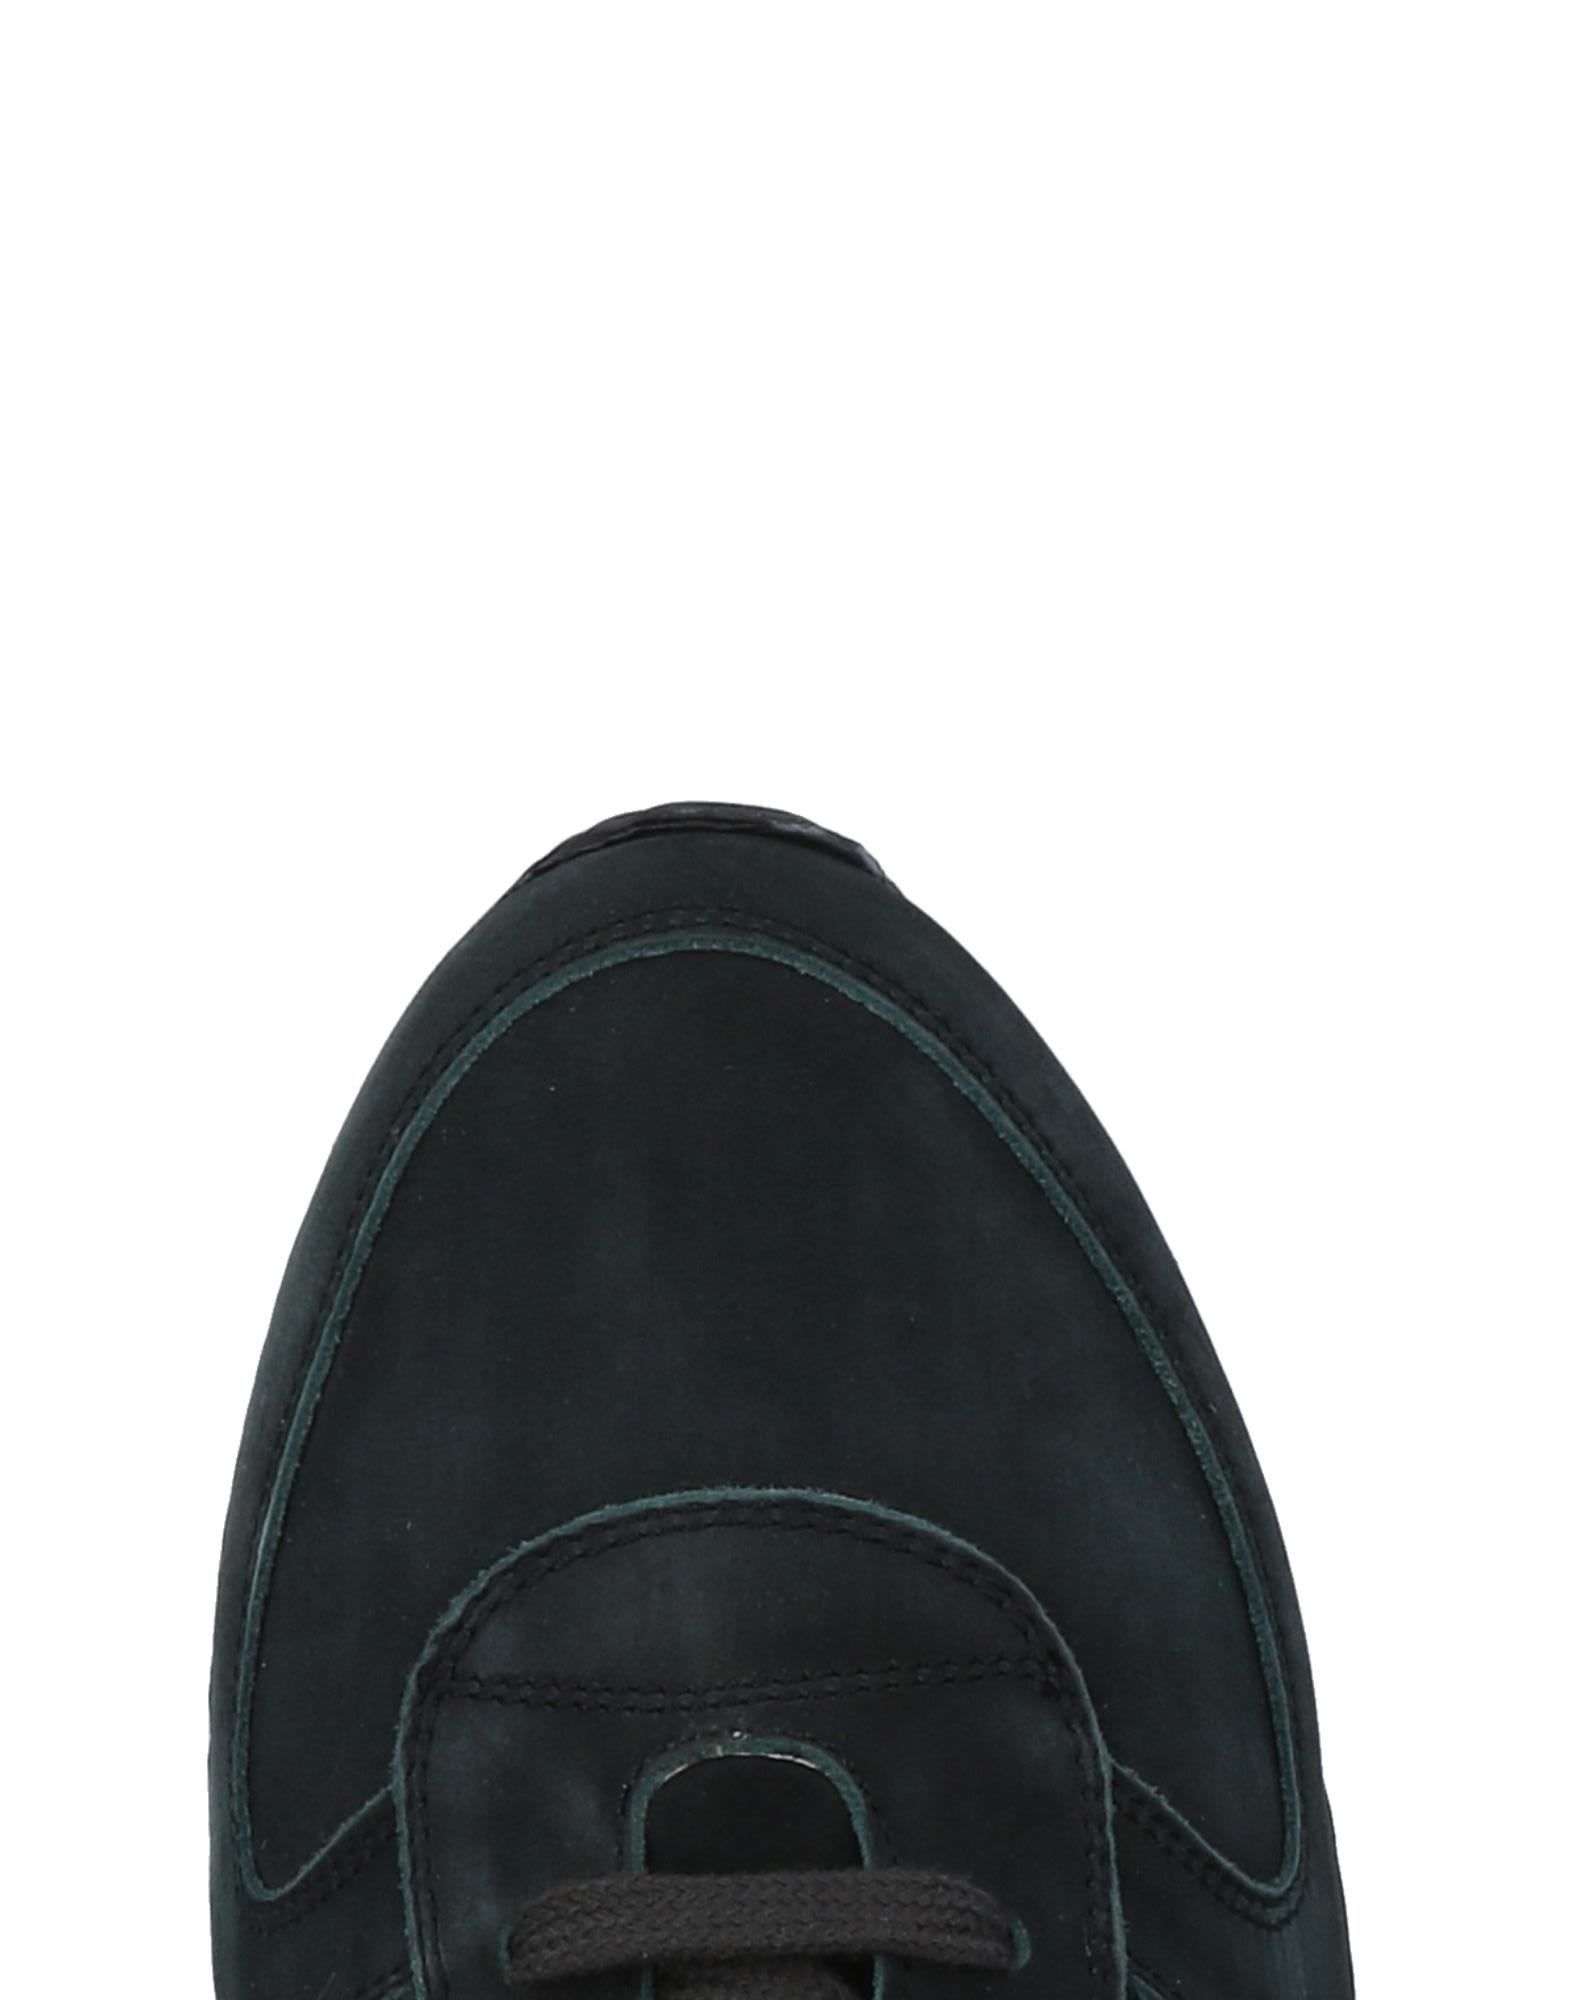 Liu •Jo Man Sneakers 11485365AV Herren  11485365AV Sneakers 64ee7f